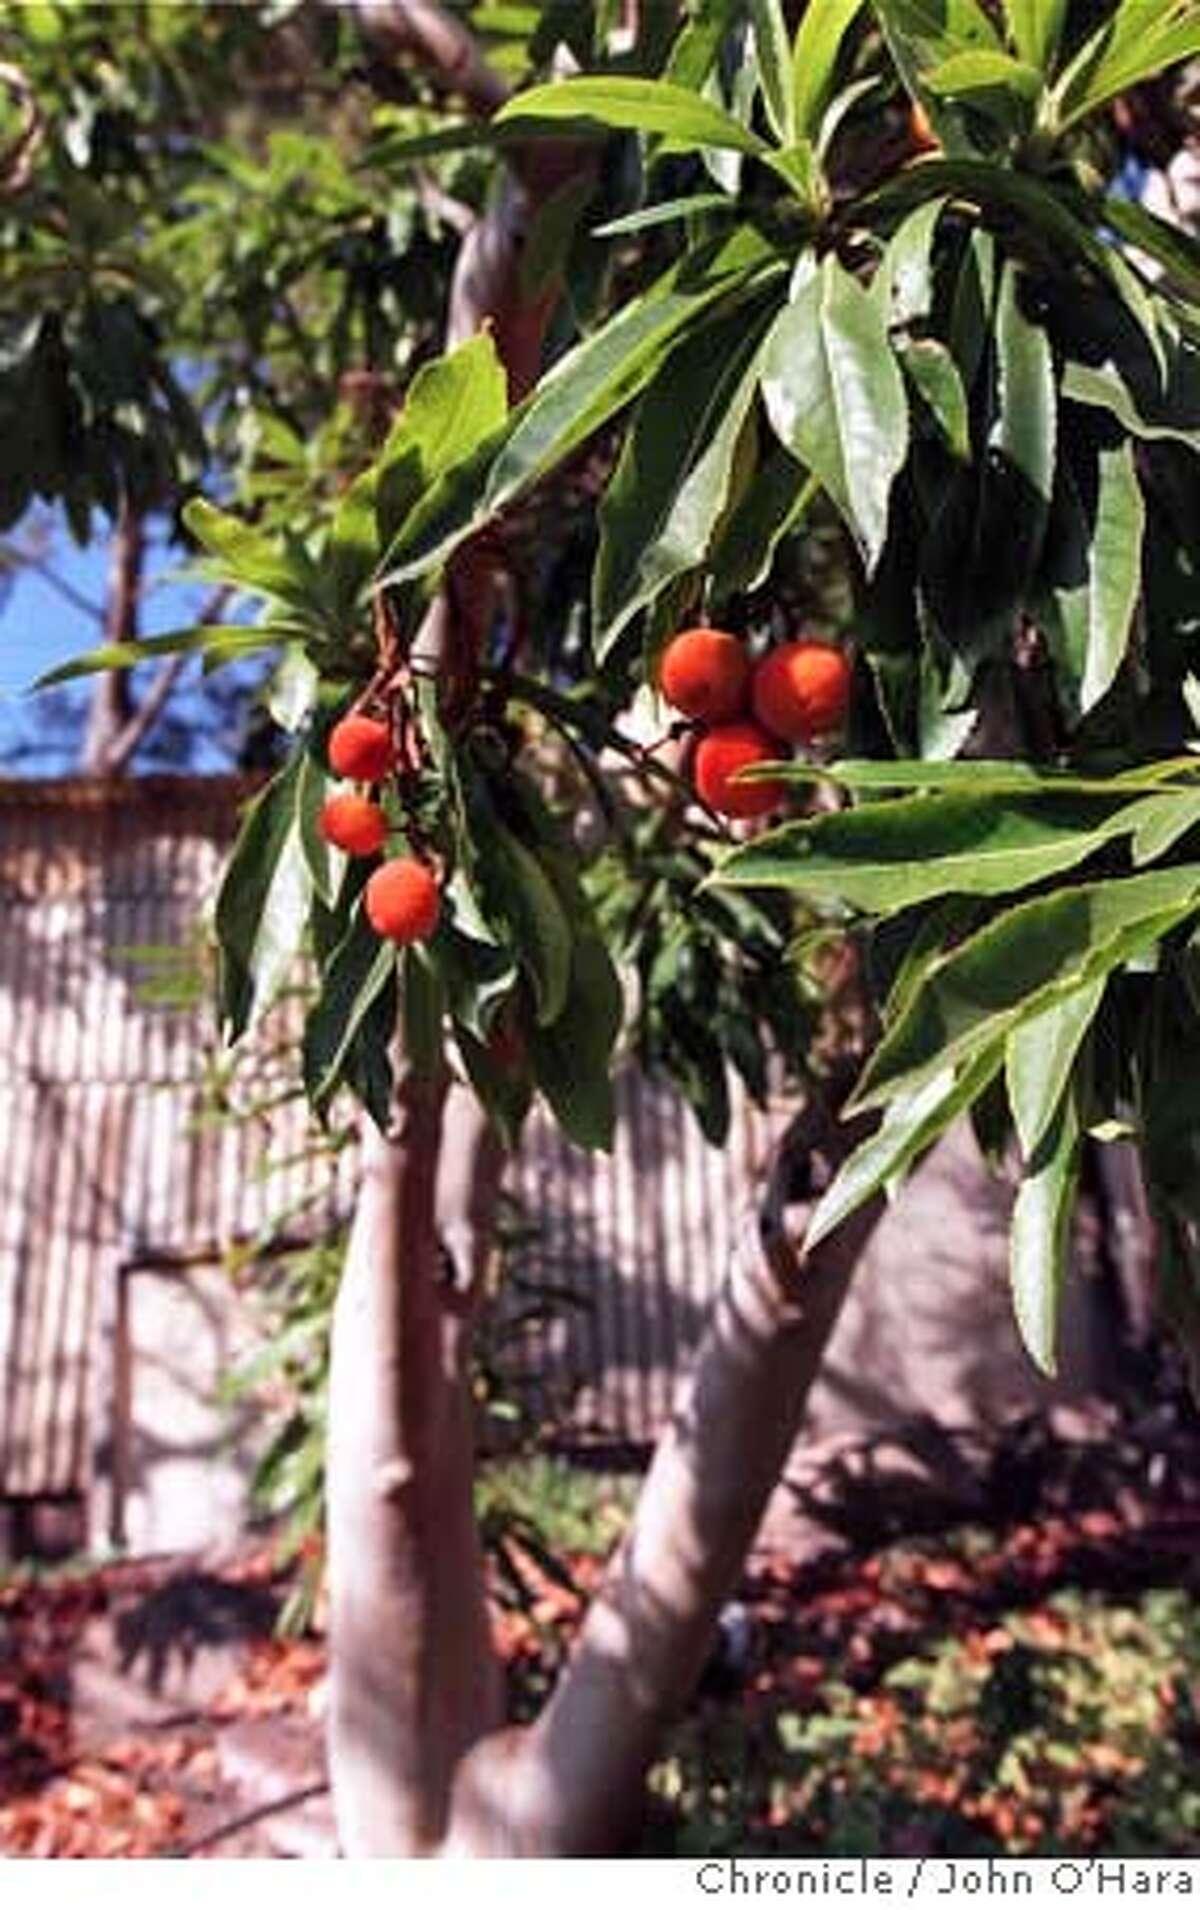 SEEDPODS1/C/19SEP95/HM/JO'H Strawberry tree (arbutus) - UC Botanical Garden - UC Berkeley PHOTO BY JOHN O'HARA